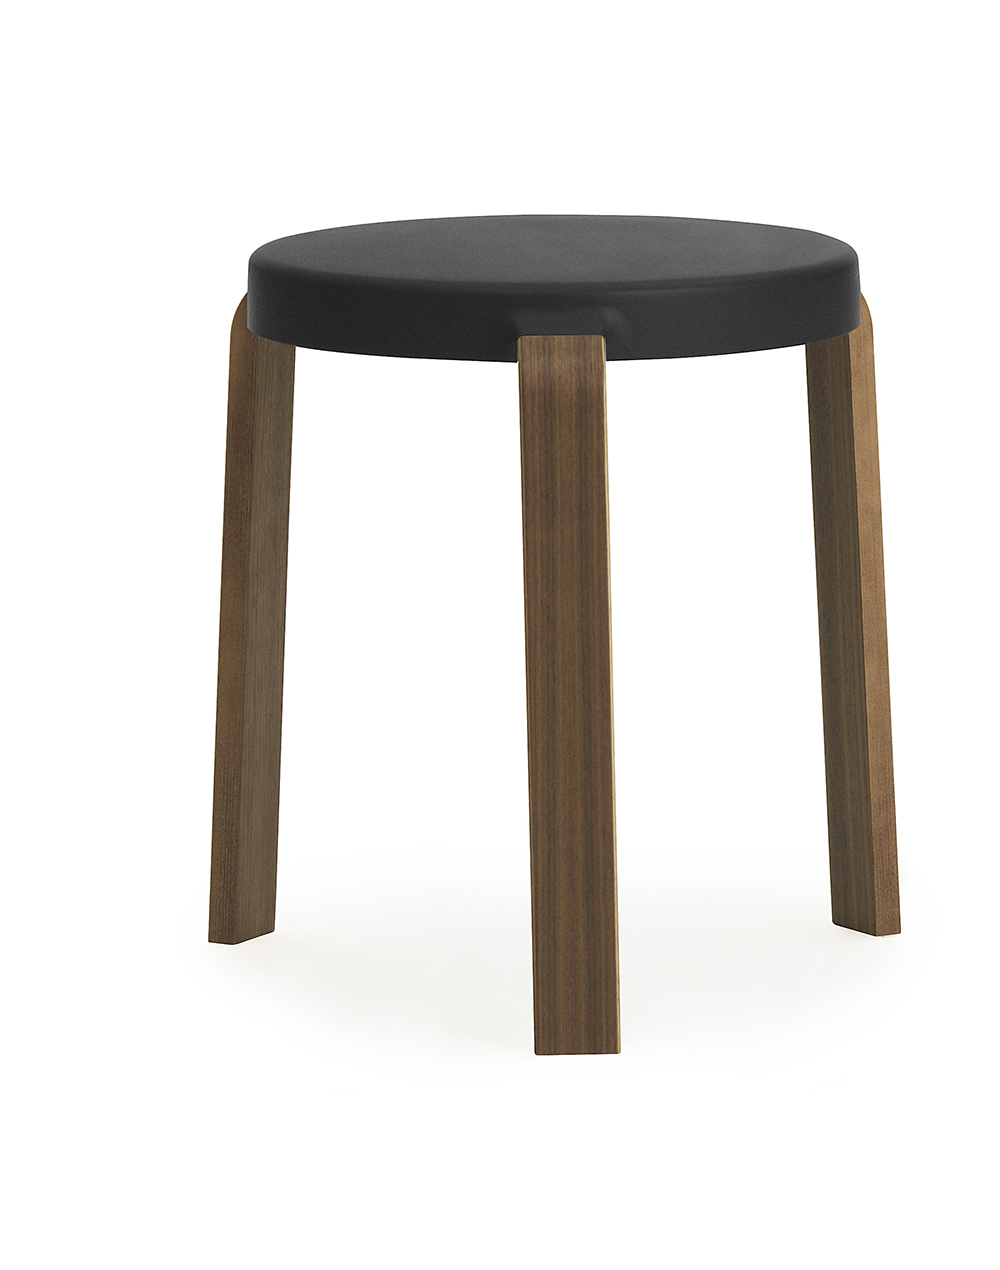 Tap szék Mobili Mania Design Bútorstúdió